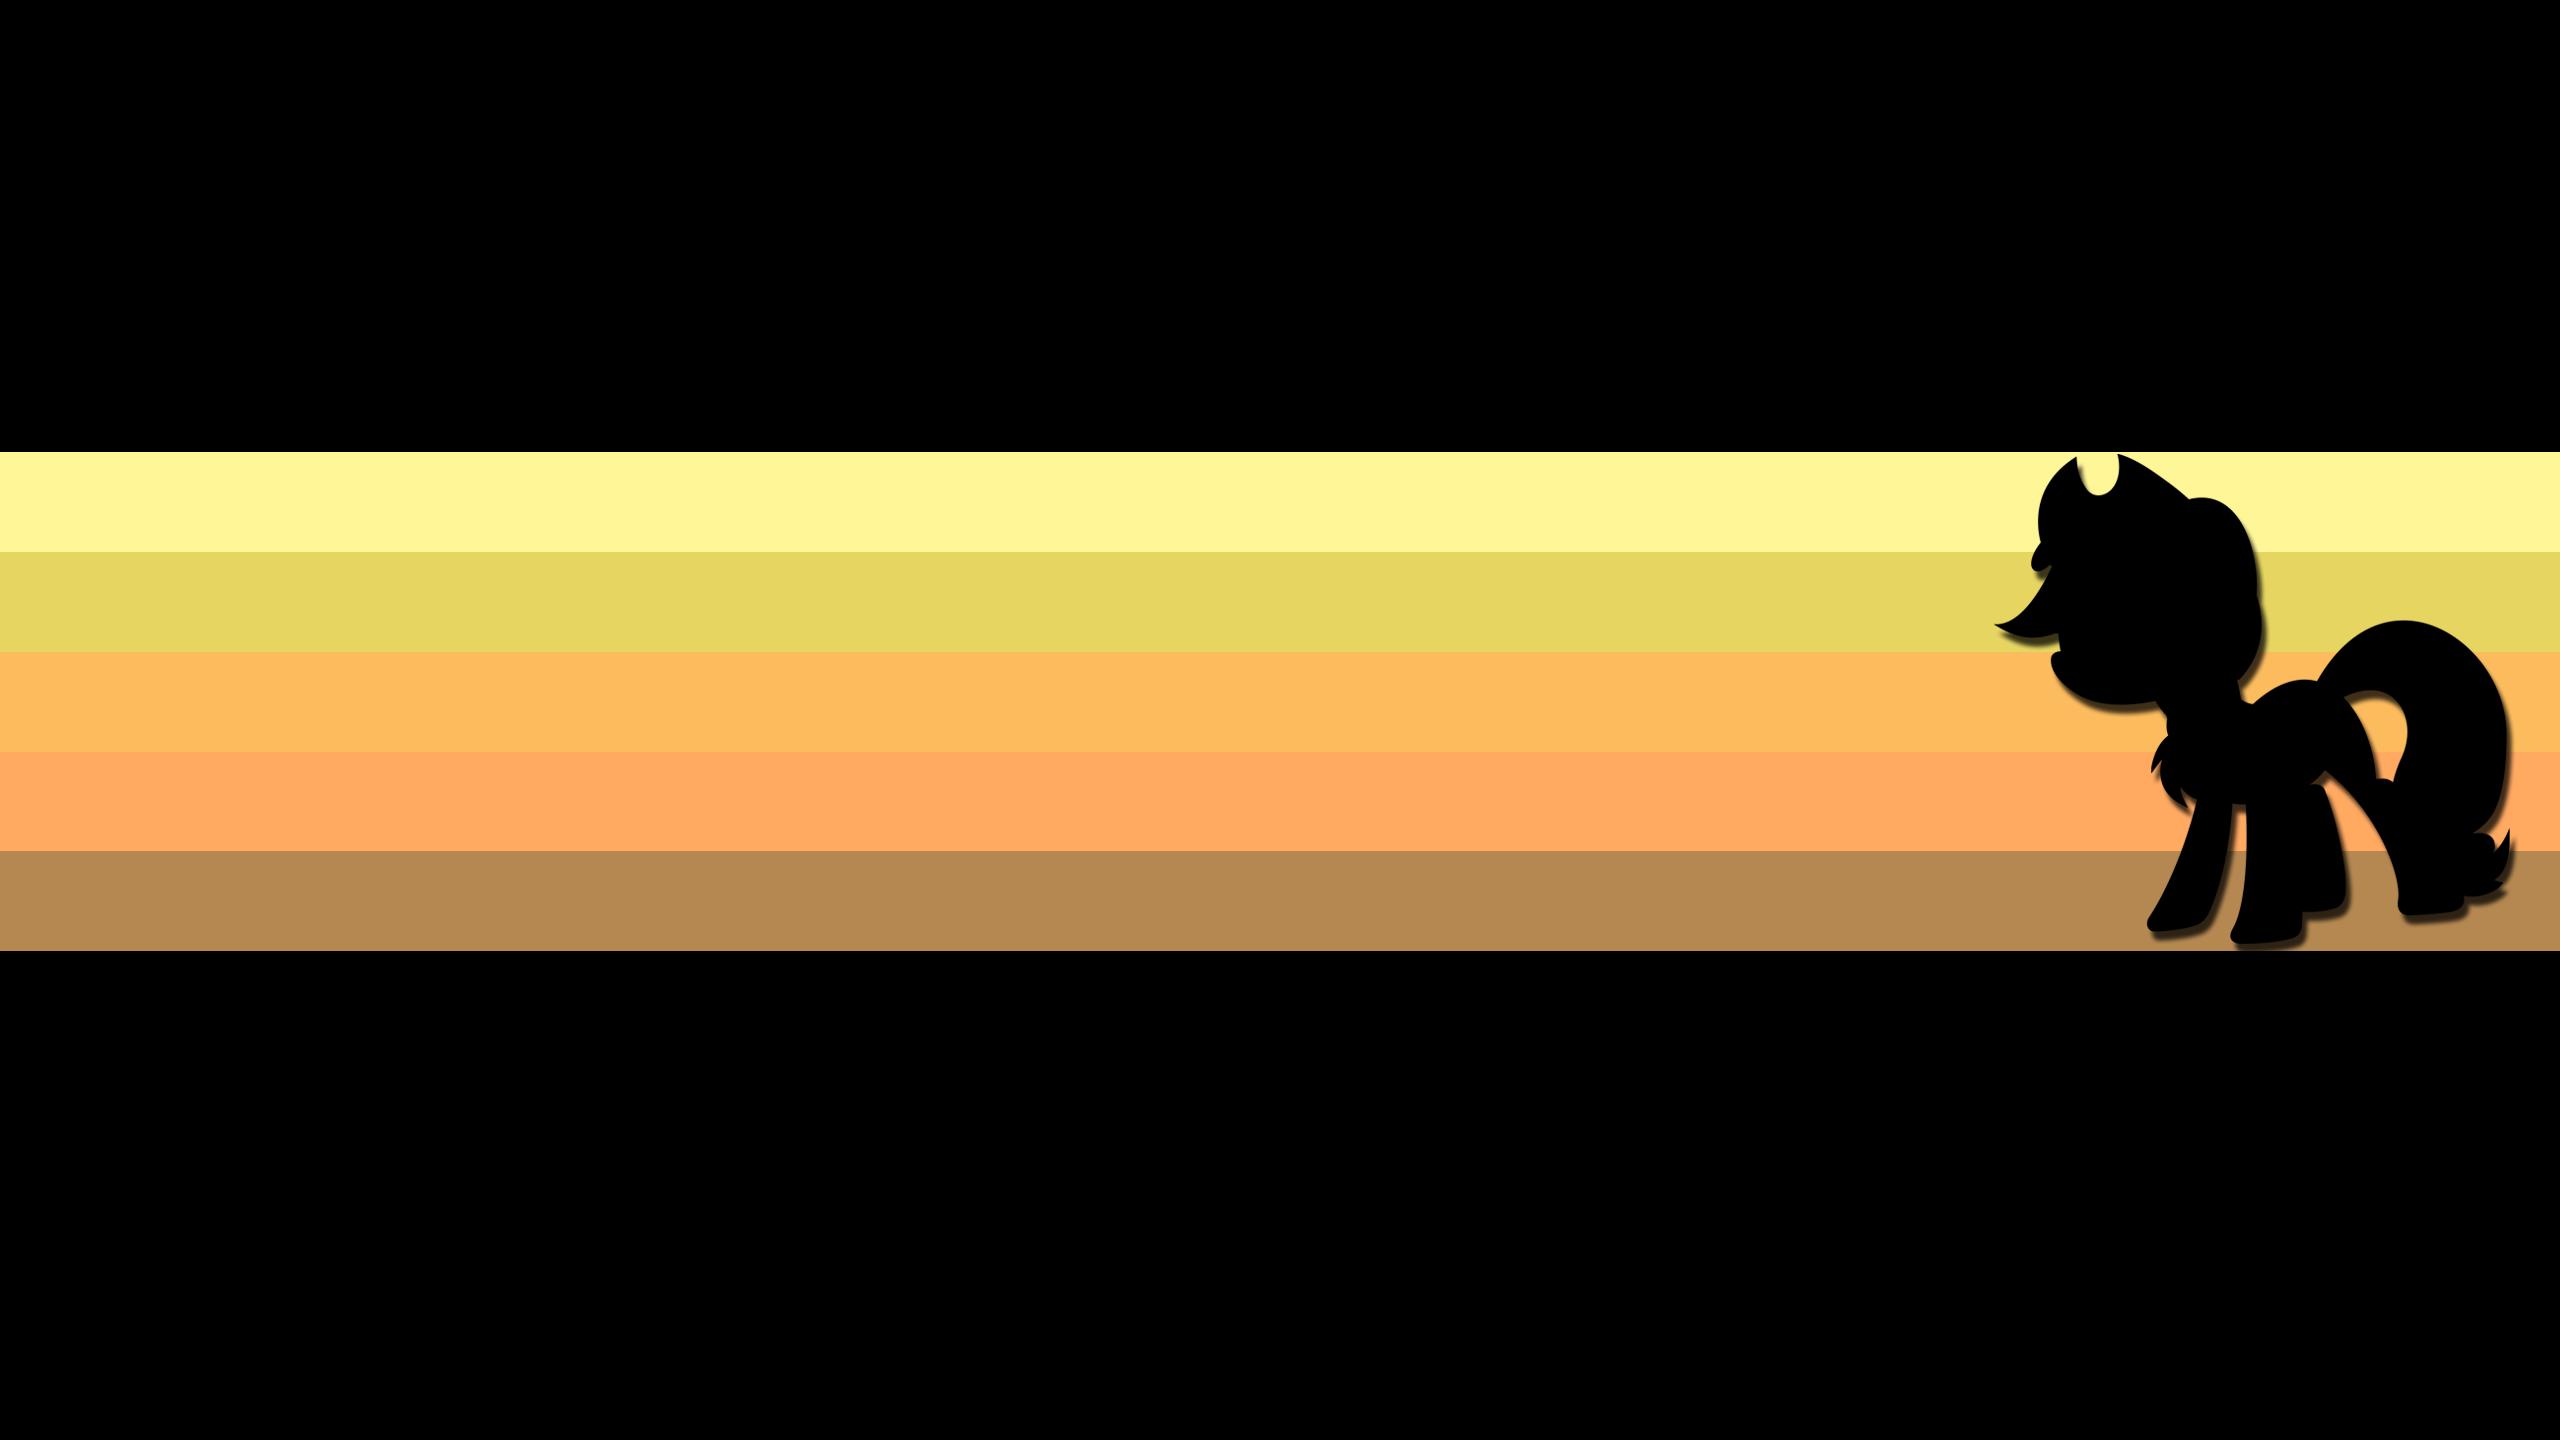 [12] Applejack: Colored Stripes by DaringDashie and DoktorRainbowFridge